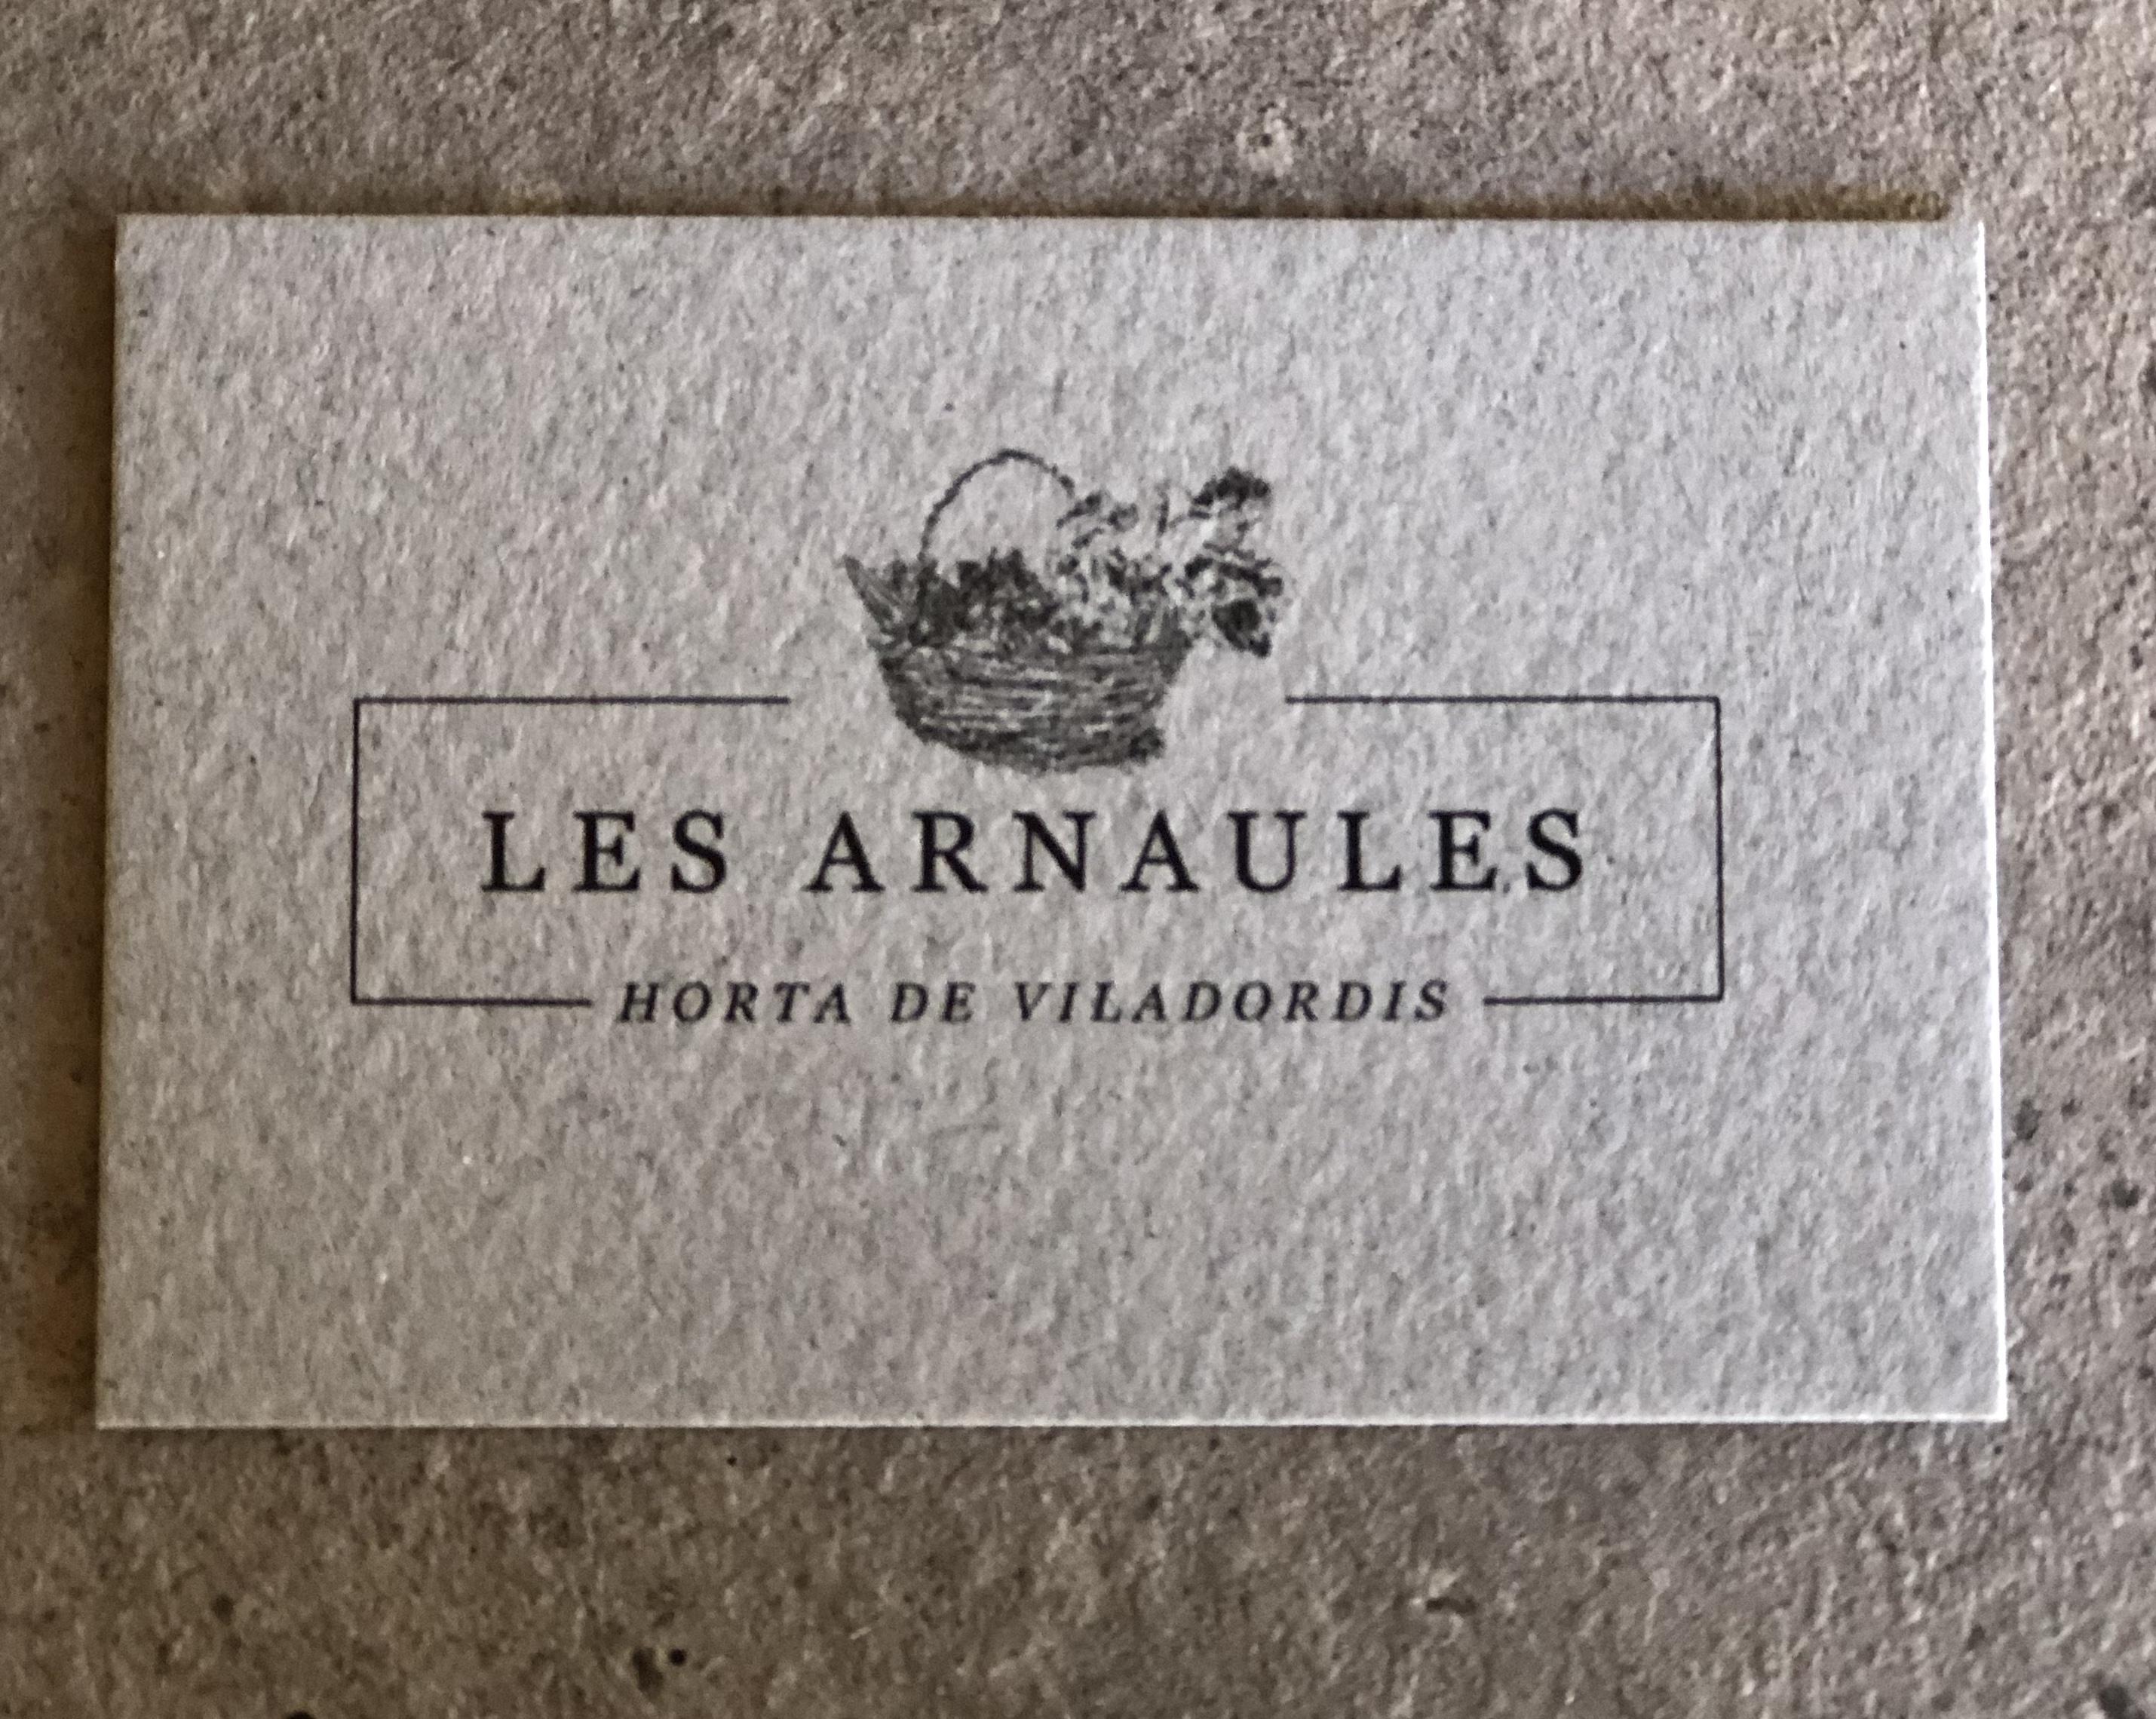 Les Arnaules